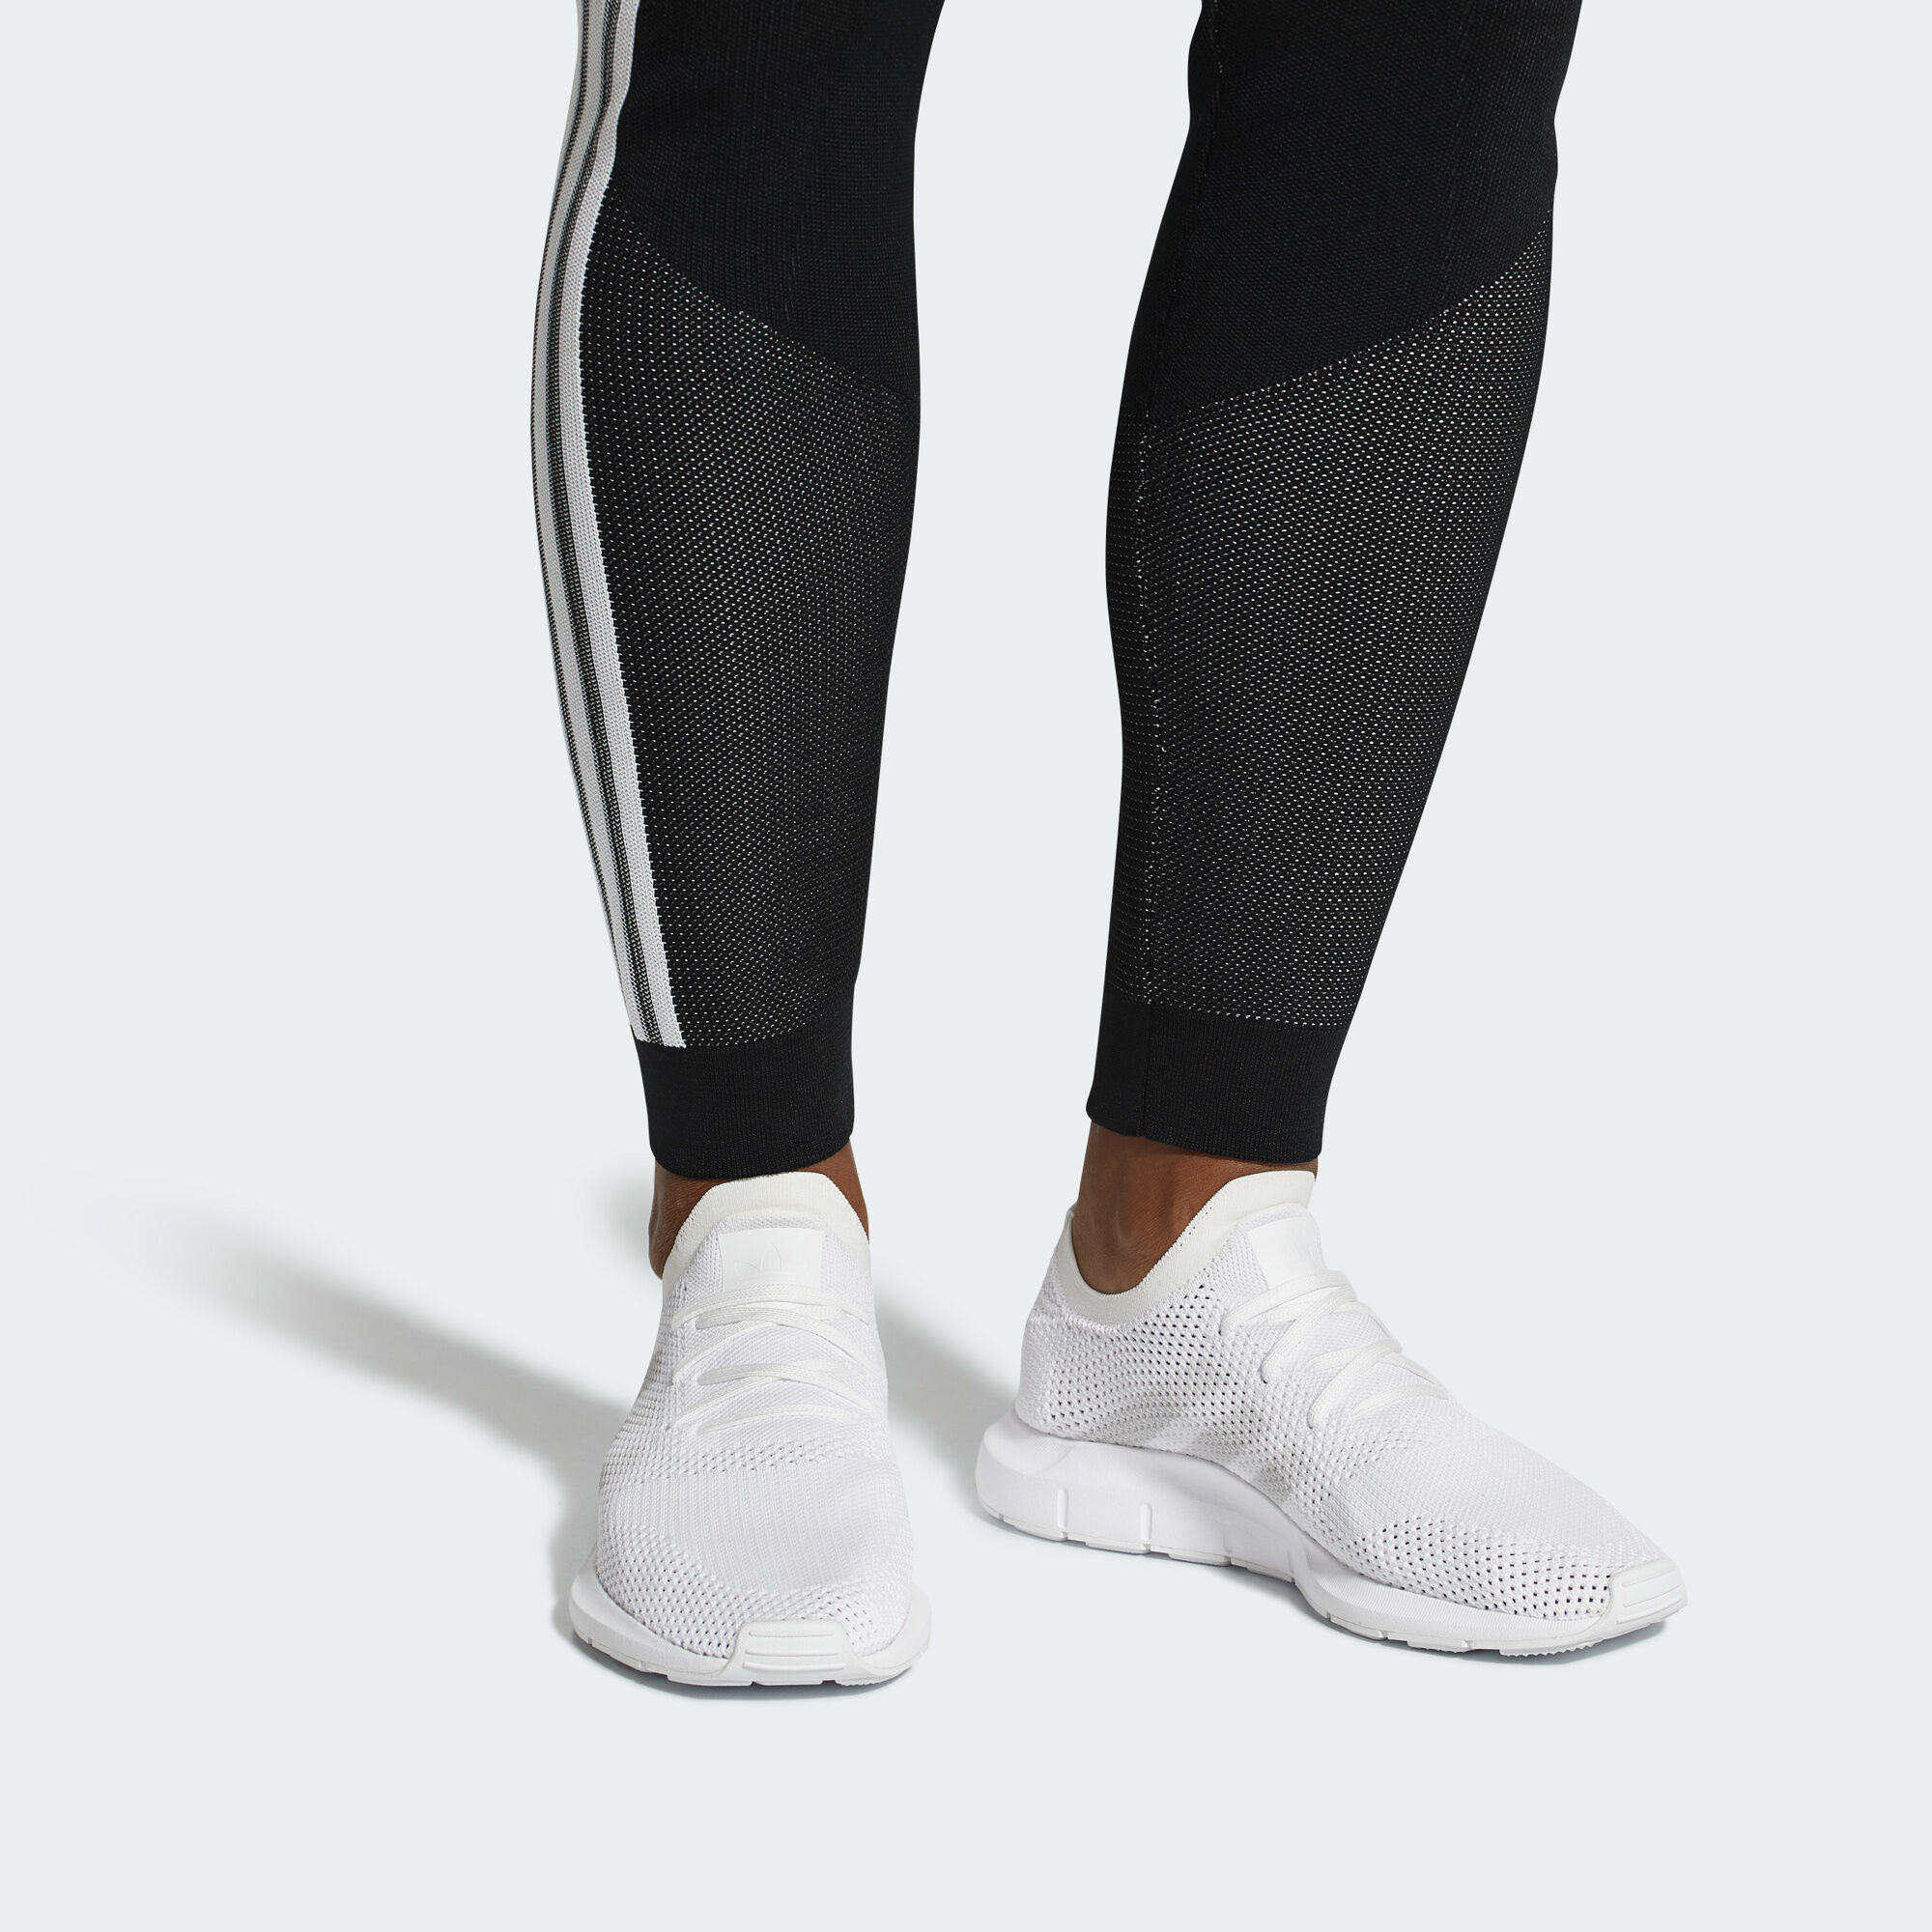 8cff2ace0083 adidas Swift Run Primeknit Shoes - Purple